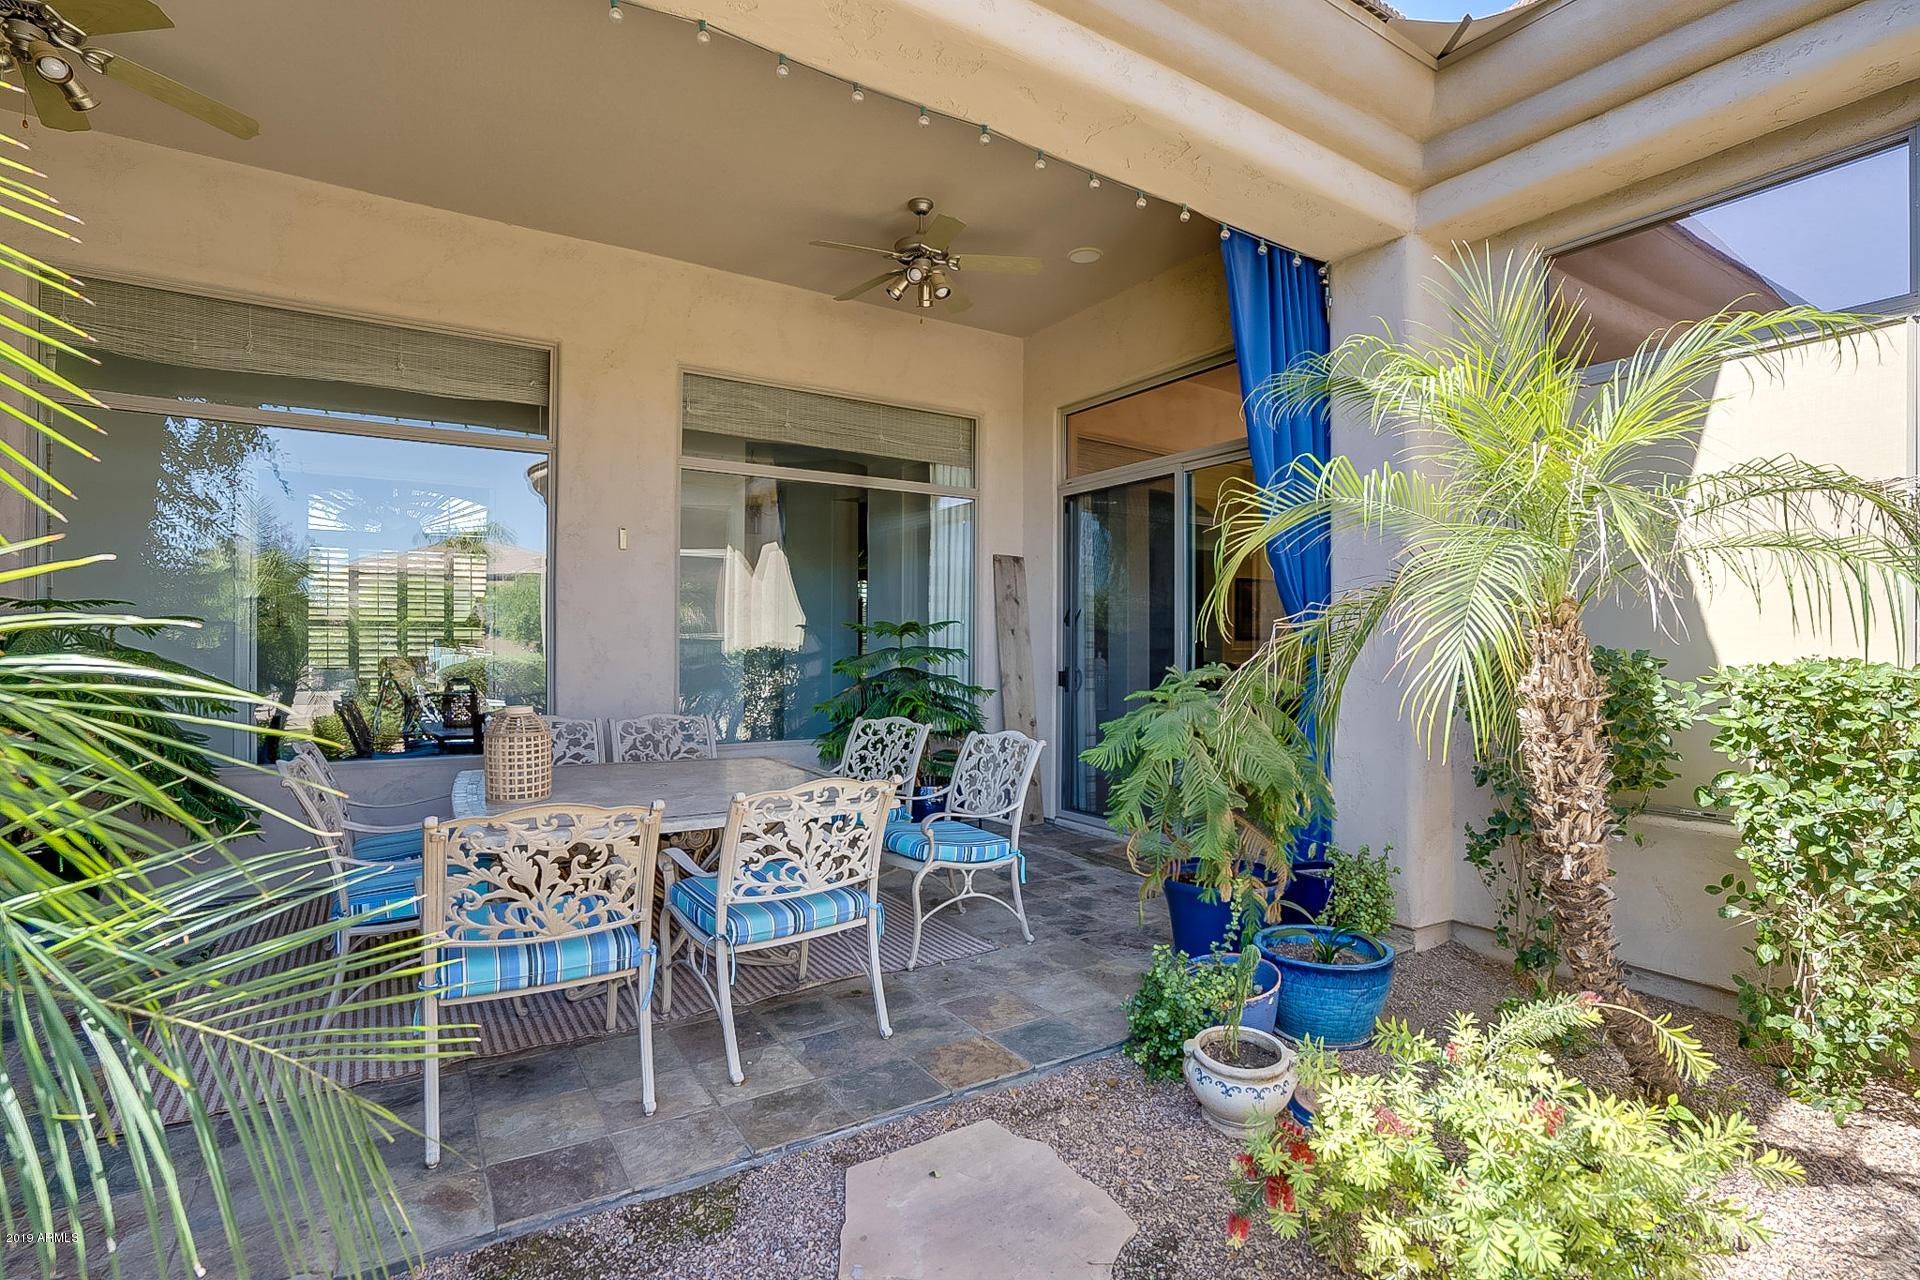 MLS 5923068 3354 E JAEGER Circle, Mesa, AZ 85213 Mesa AZ The Groves